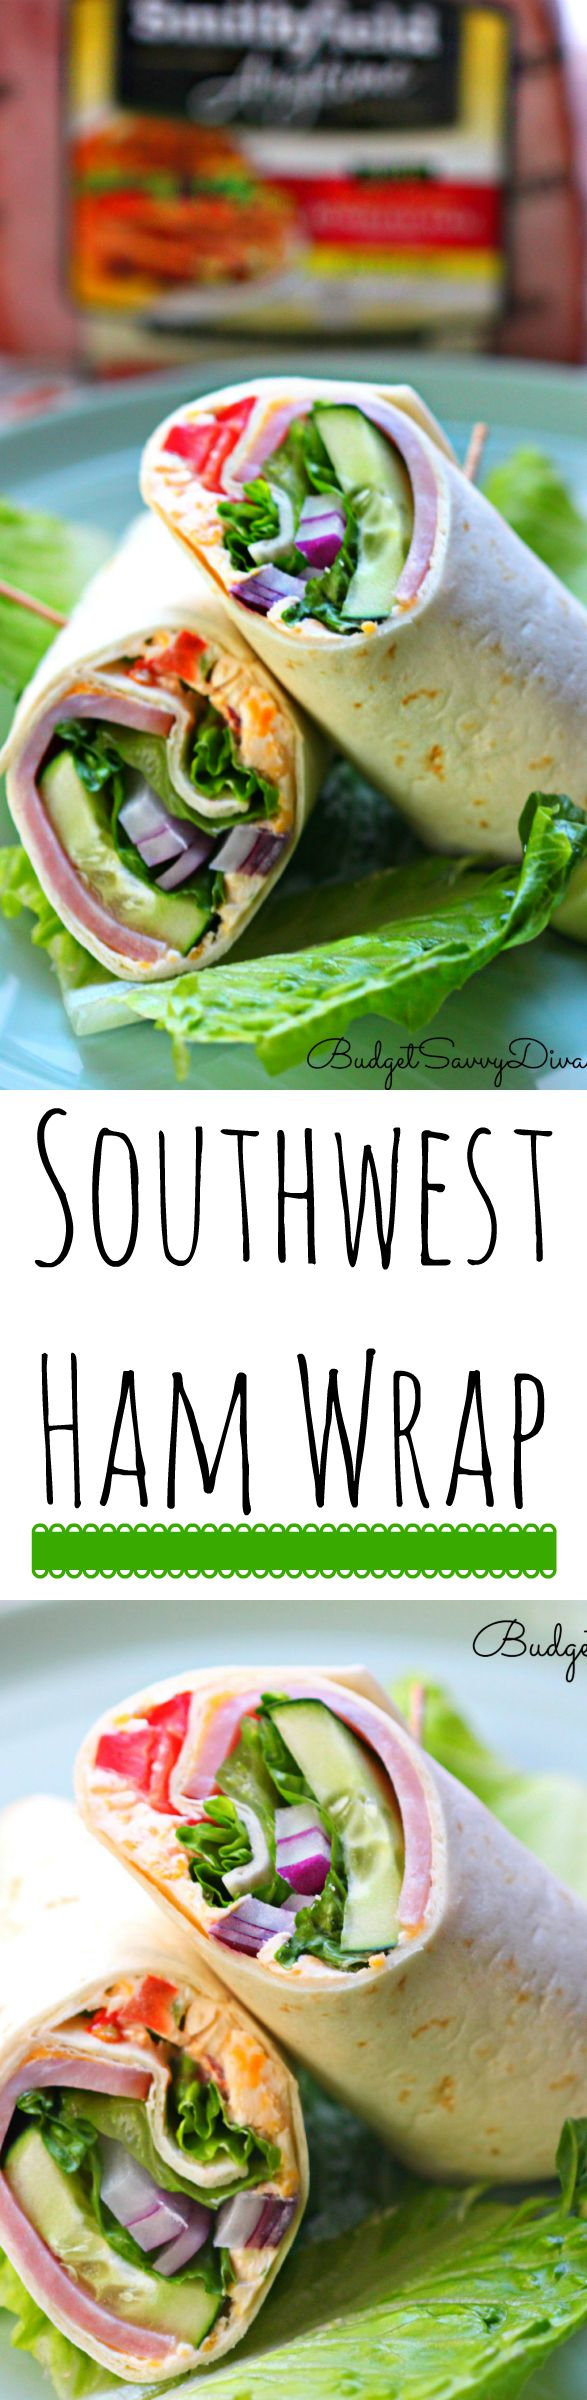 FINAL Ham Wrap